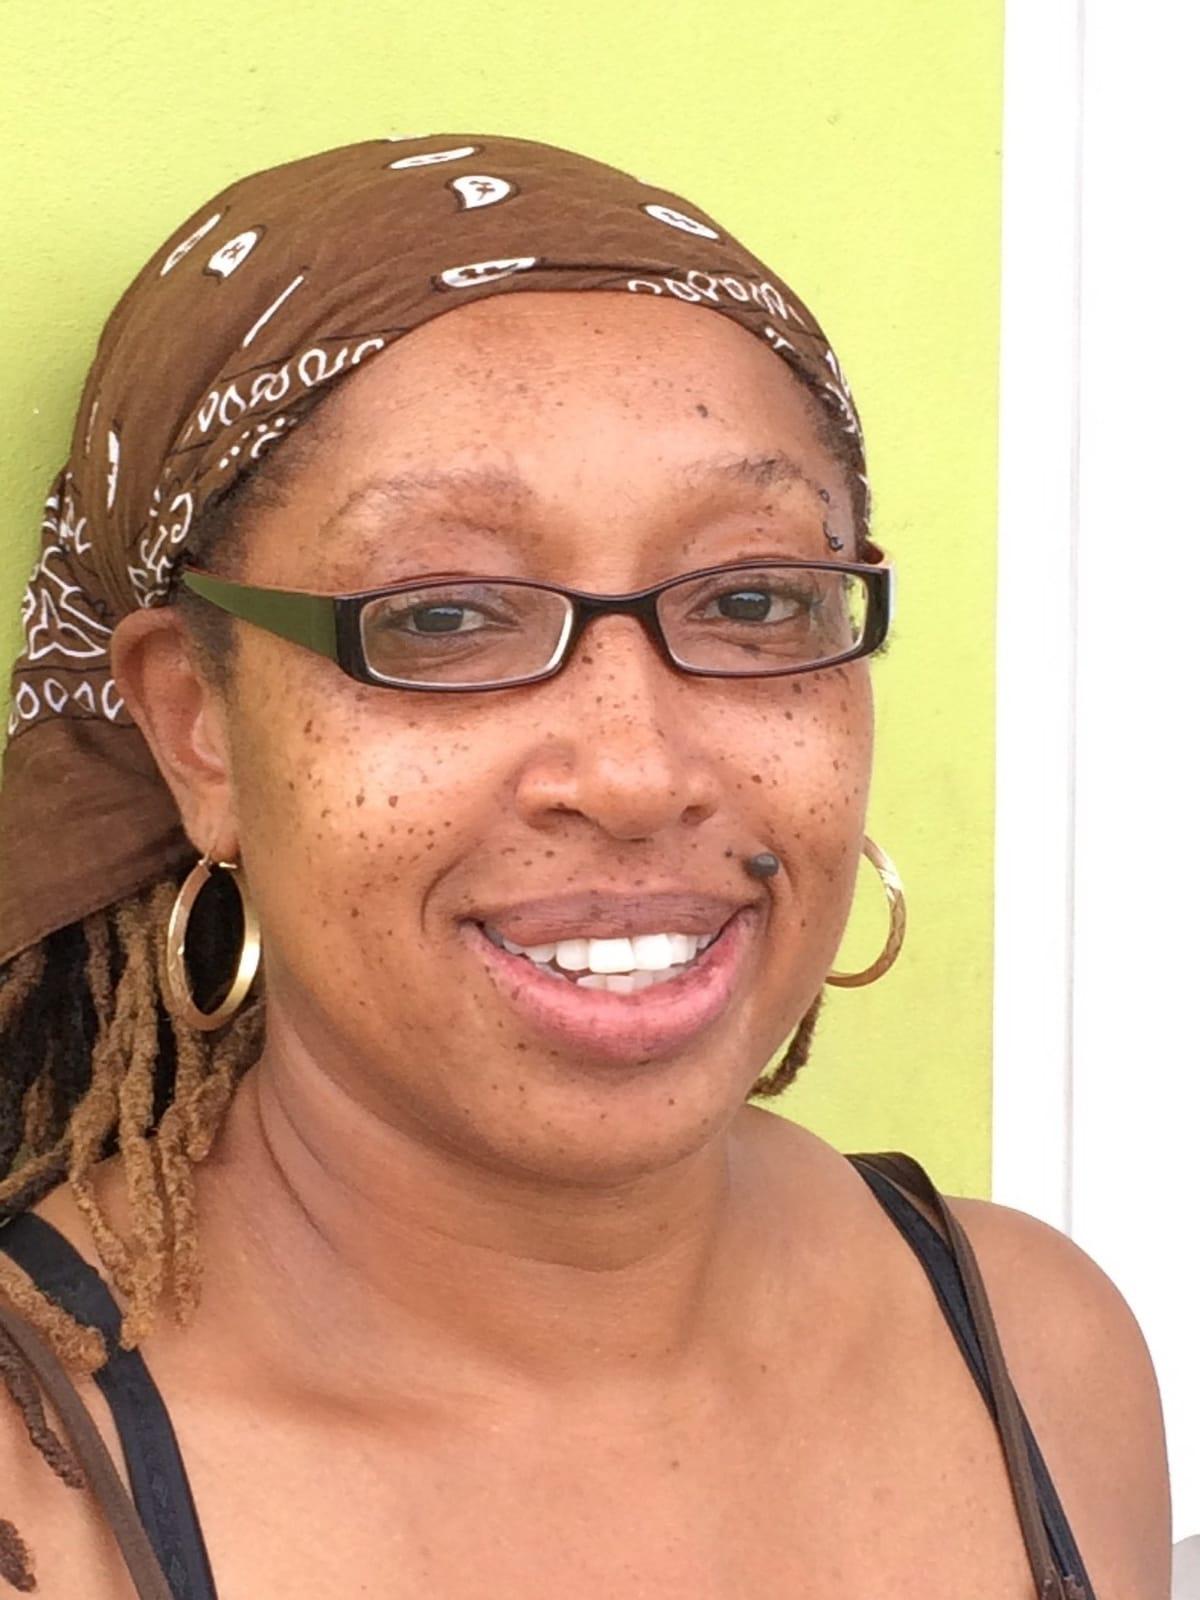 Karen from St Kitts and Nevis